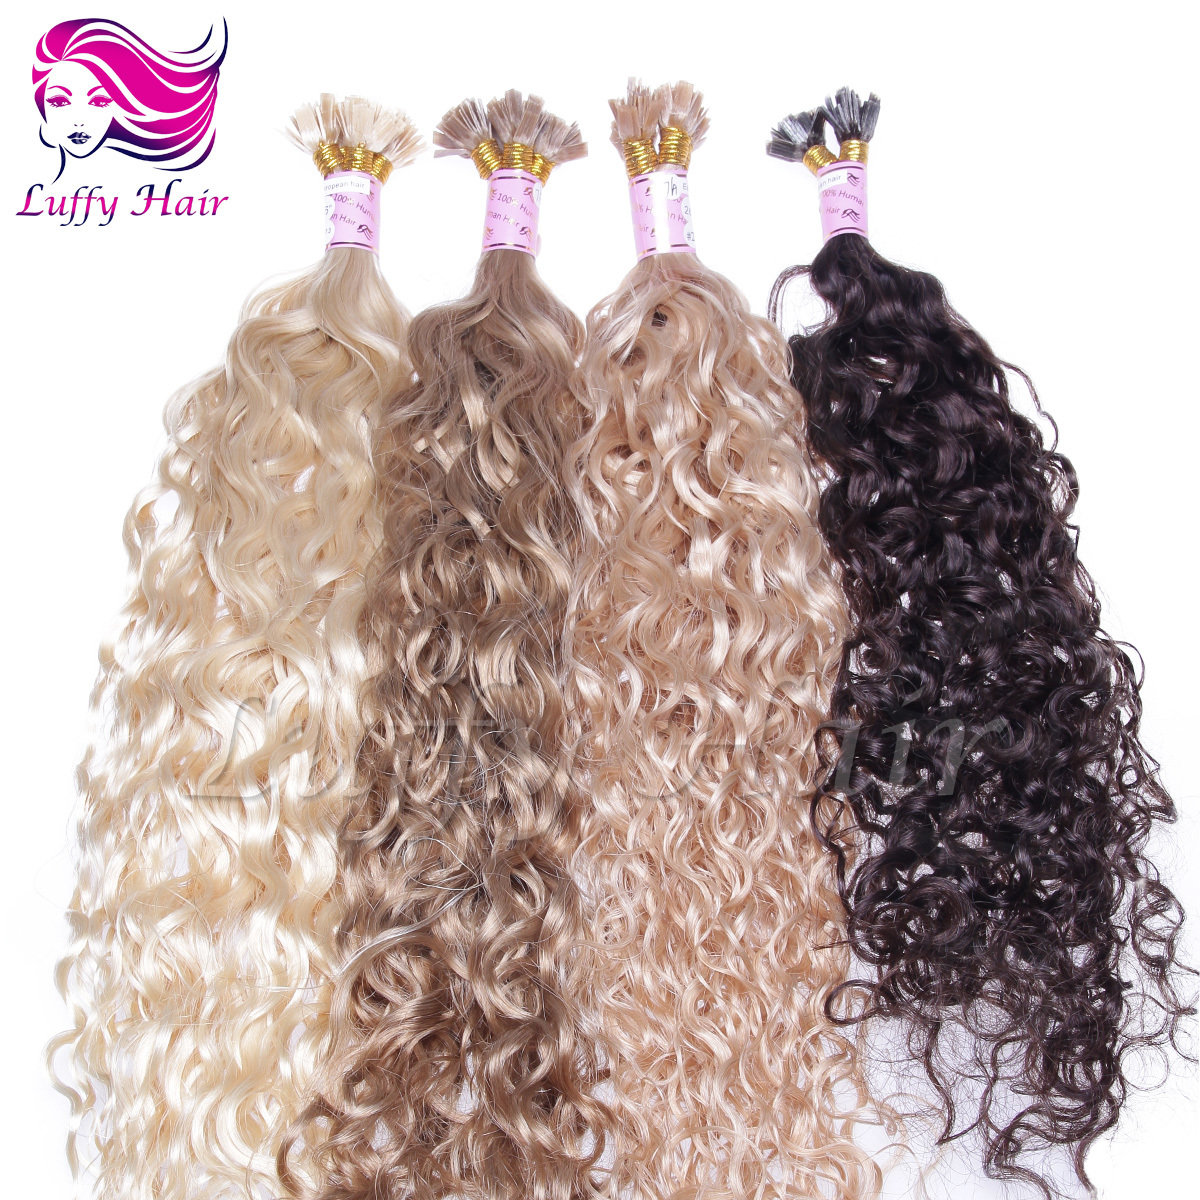 8A Virgin Human Hair Water Wave Fusion Hair Extensions - KFL007